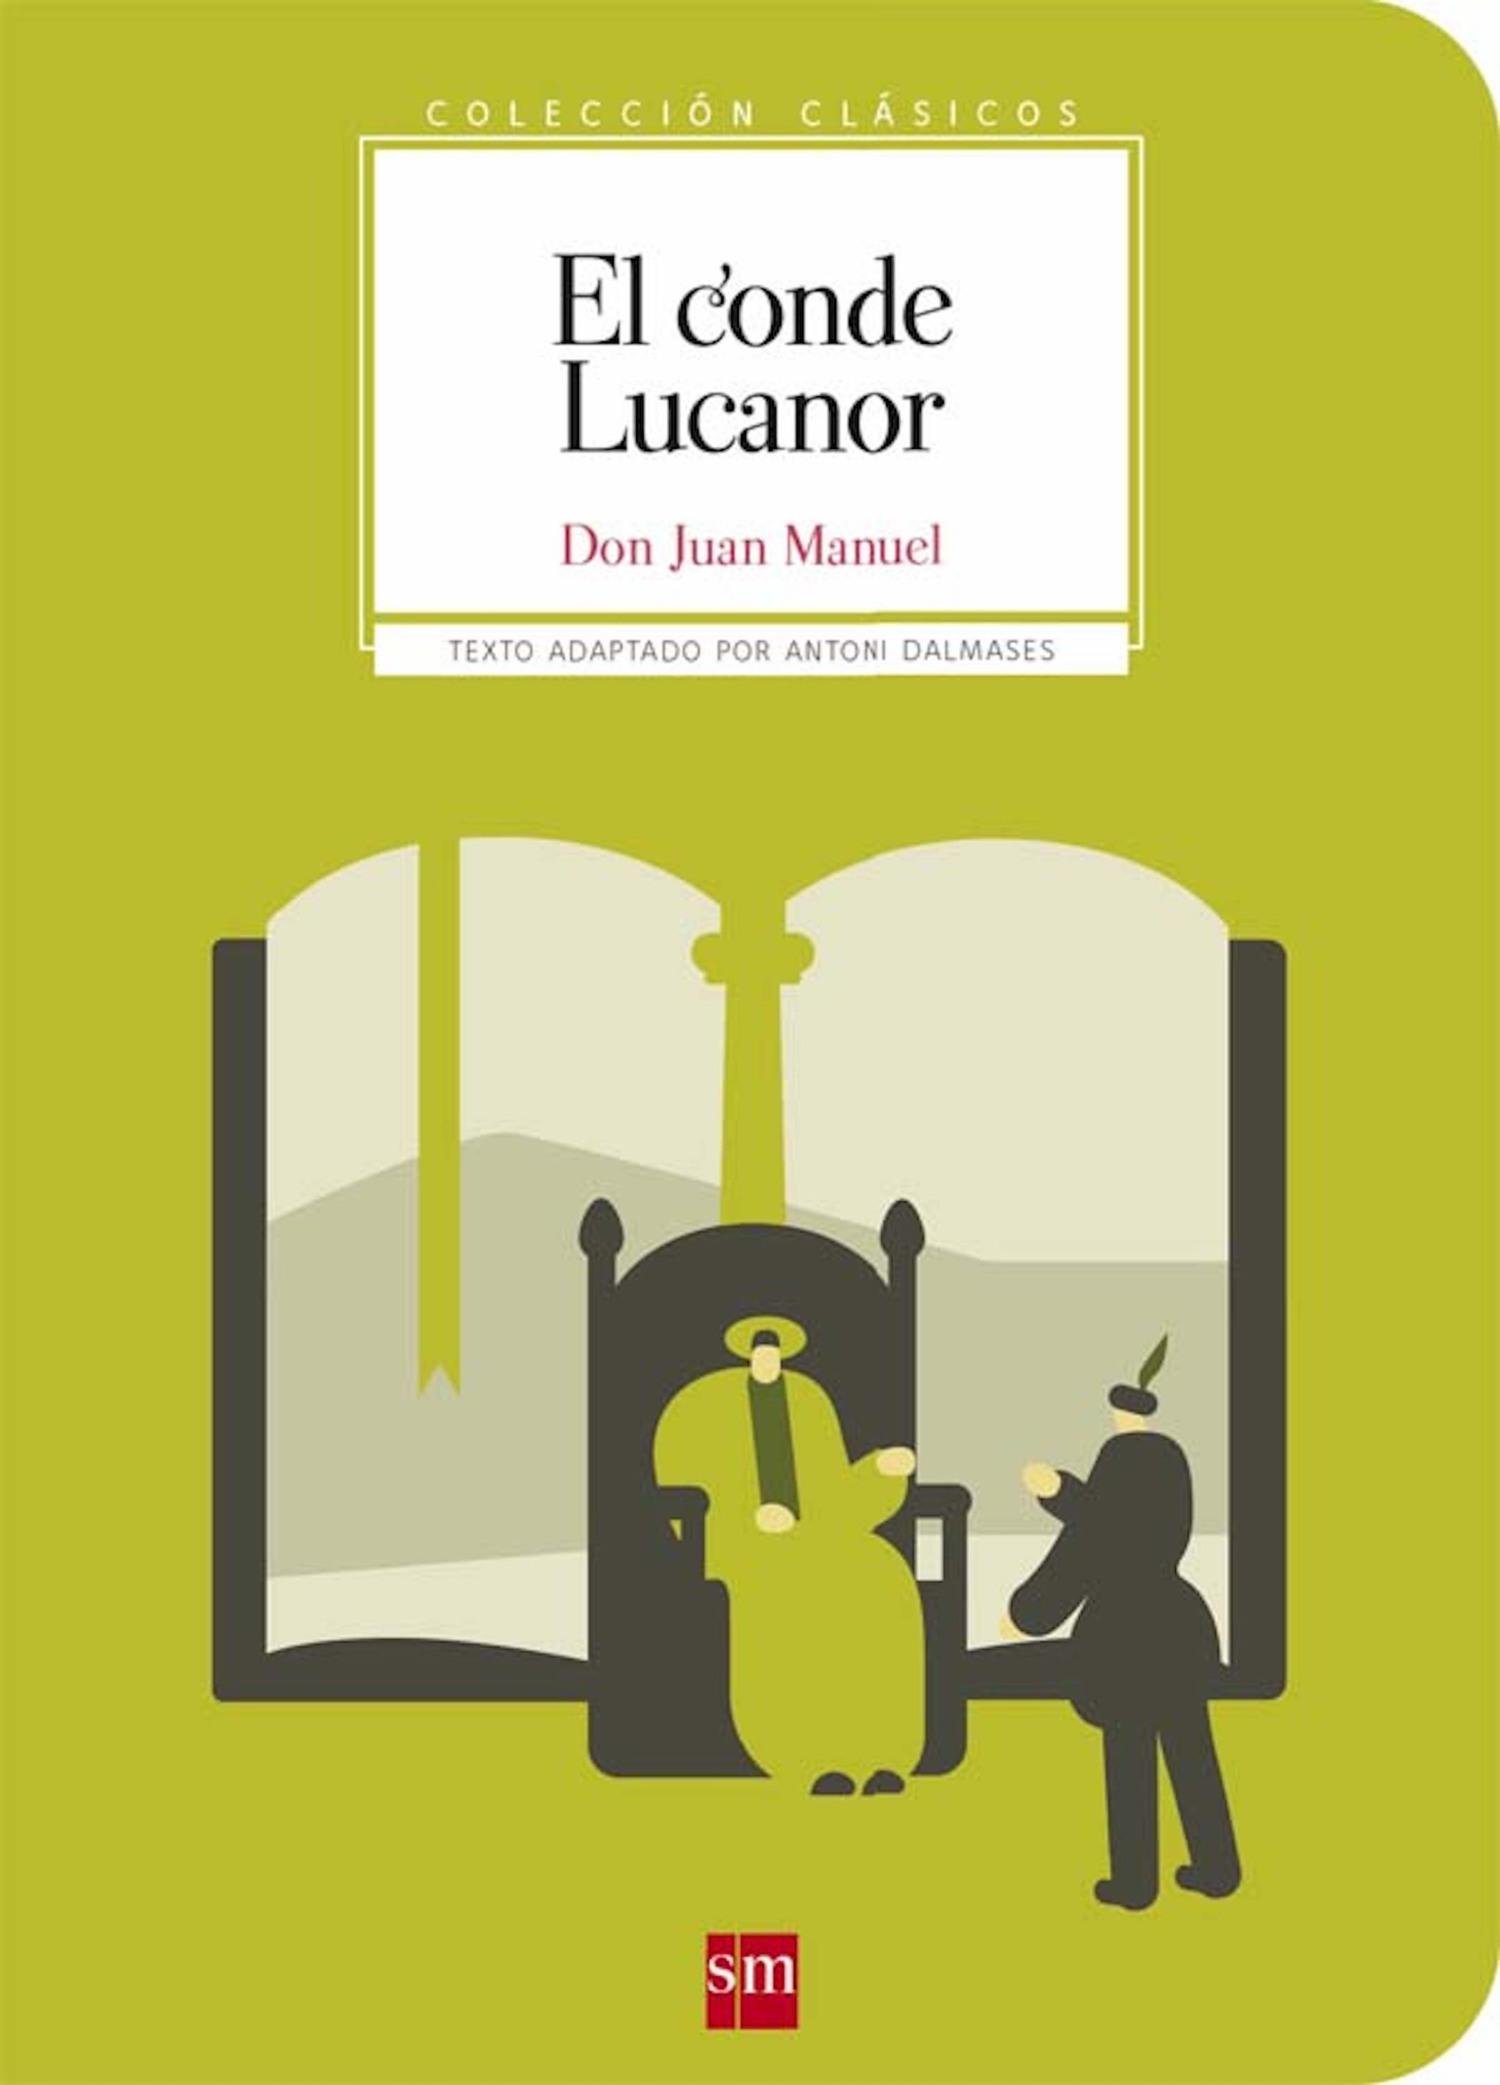 Don Juan Manuel El conde Lucanor adolph schaden der deutsche don juan